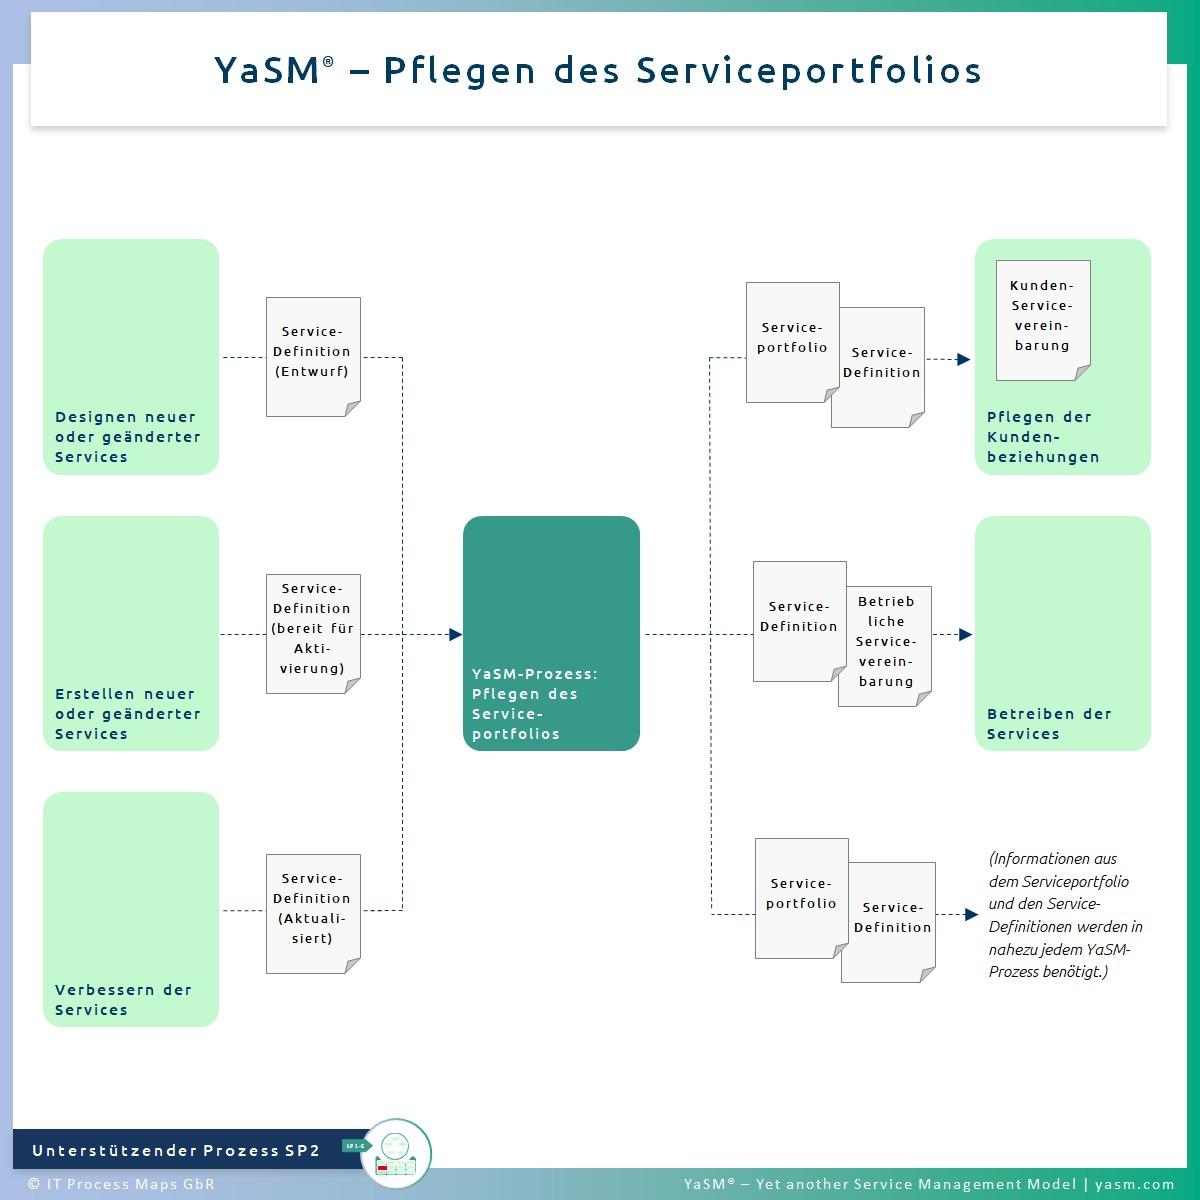 Abb. 1: Pflegen des Serviceportfolios. - YaSM Service-Portfolio-Management-Prozess SP2. - Kompatibel mit der Practice ITIL 4 Portfolio Management sowie ITIL 4 Service Catalogue Management.